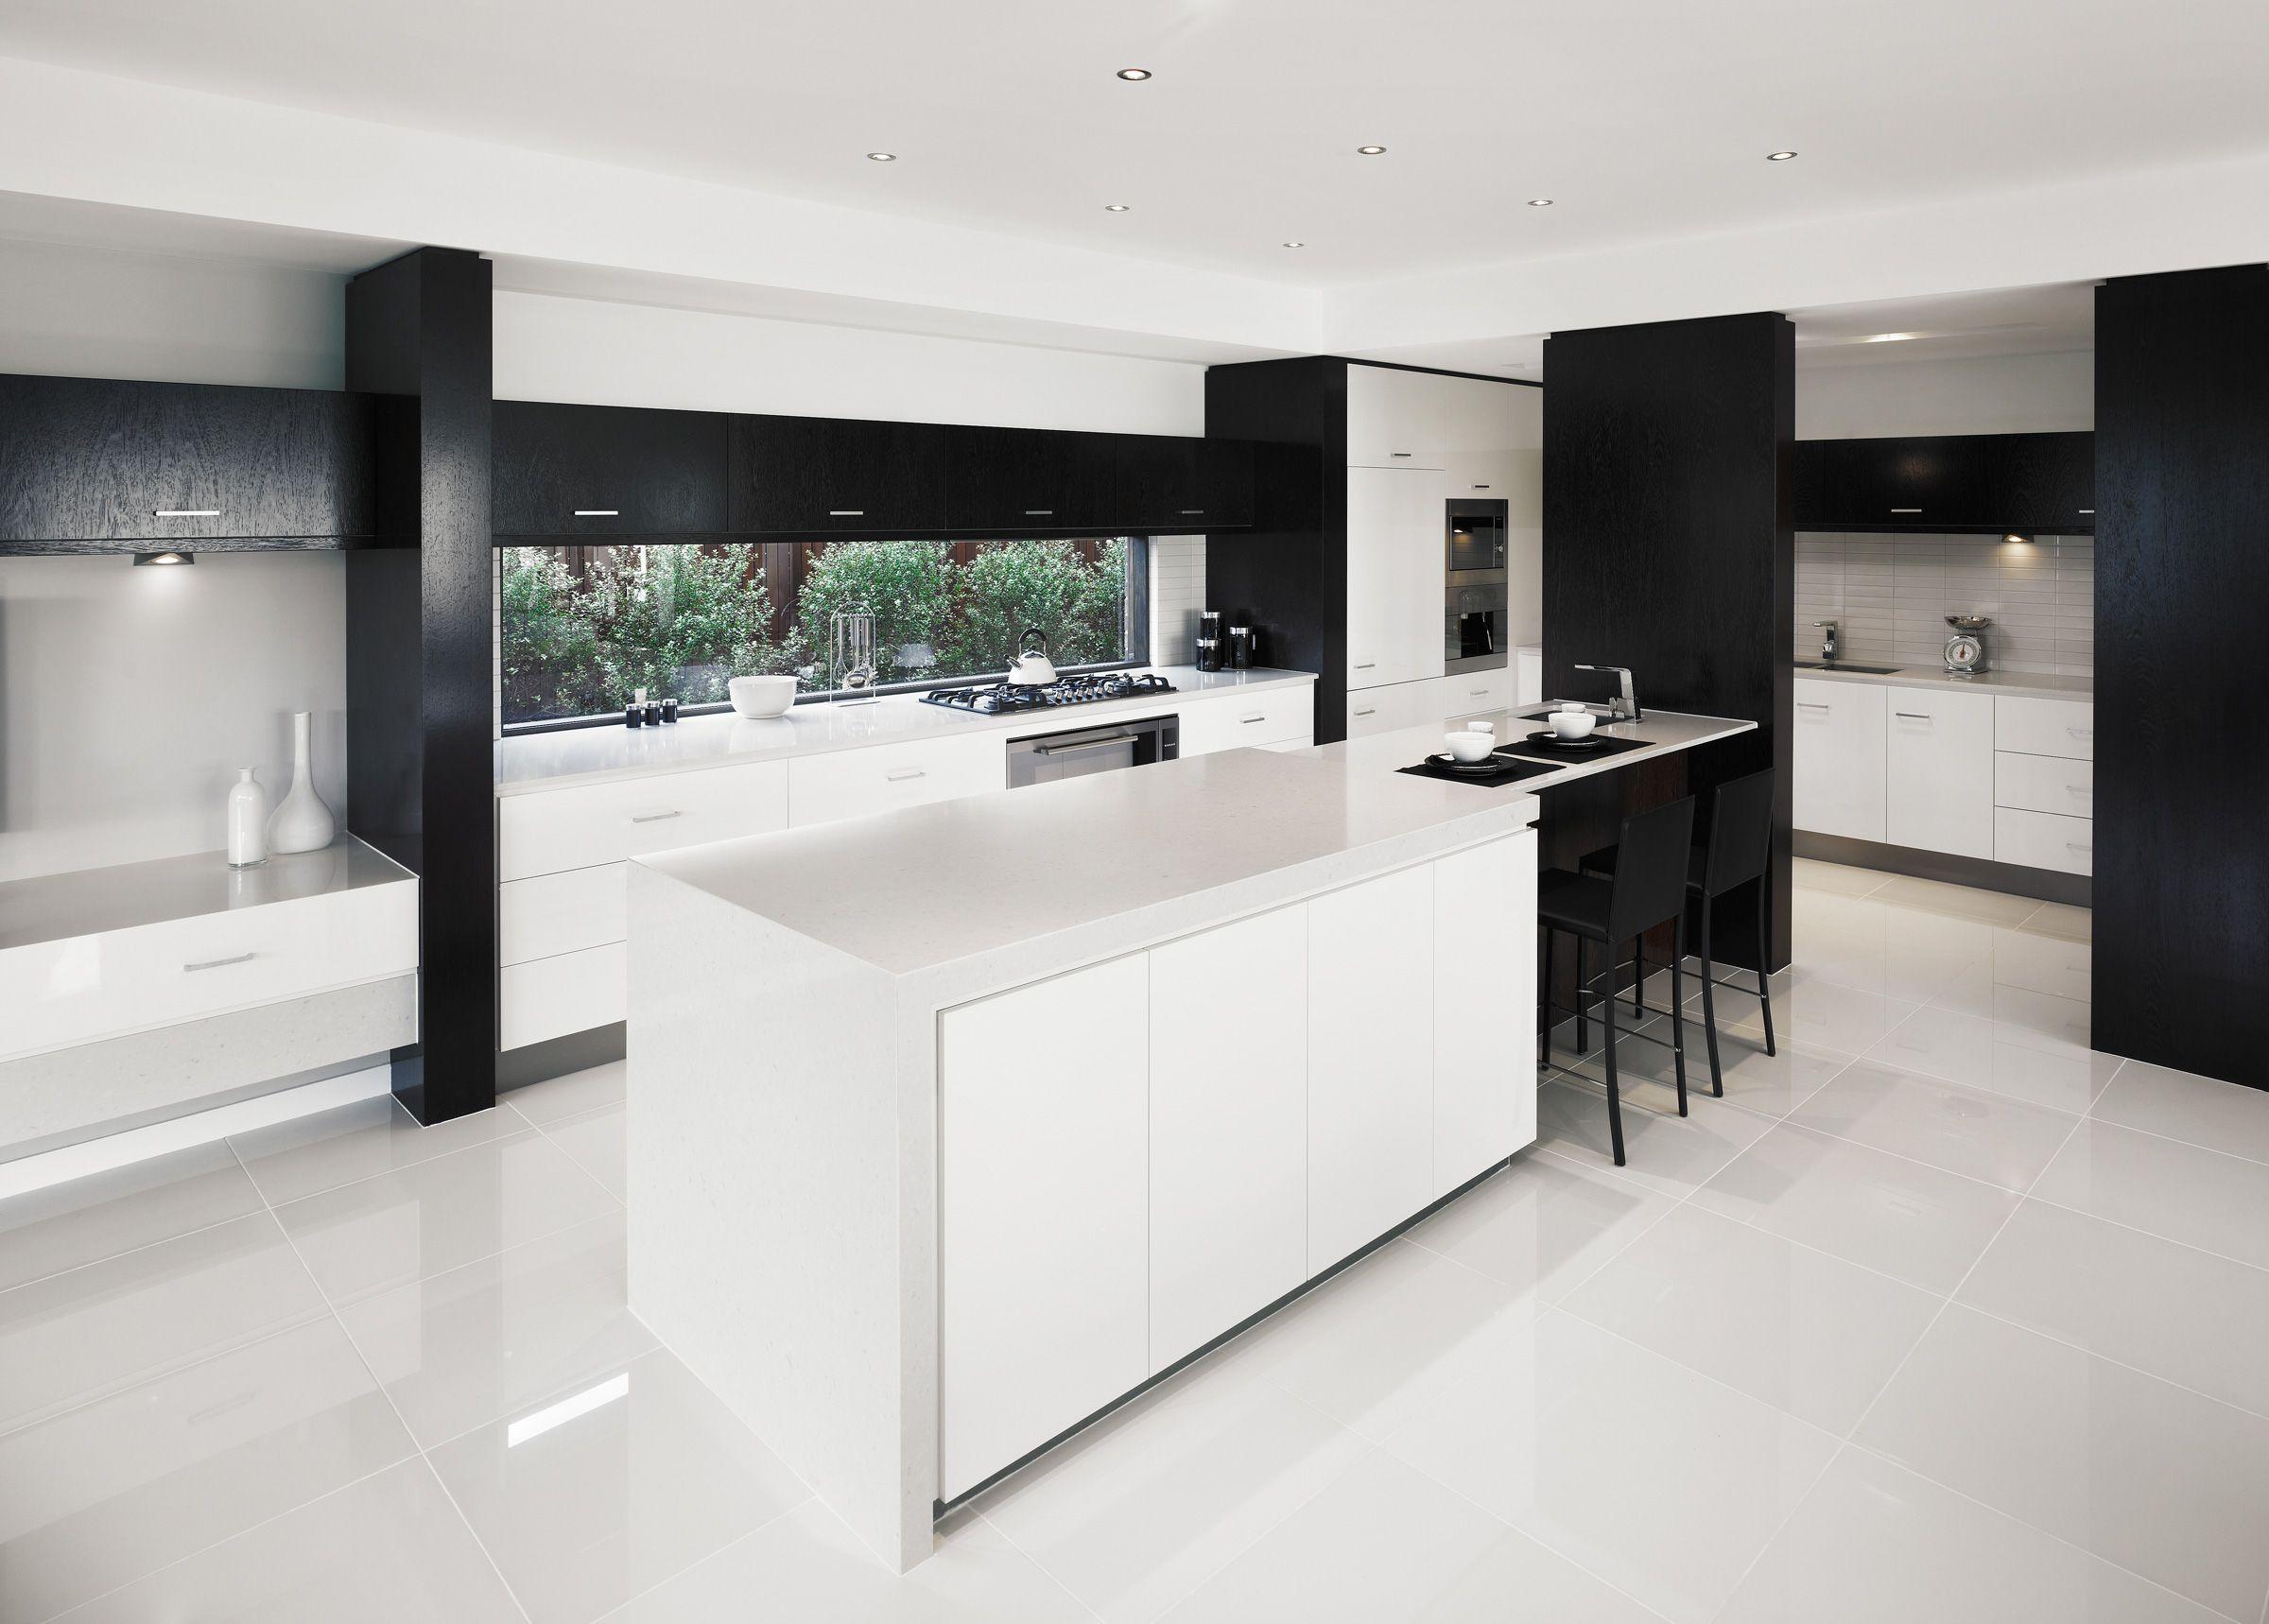 Metricon Homes Victoria Australia 9141 Ice Snow | White Tile Kitchen Floor, White Kitchen Floor, Kitchen Flooring